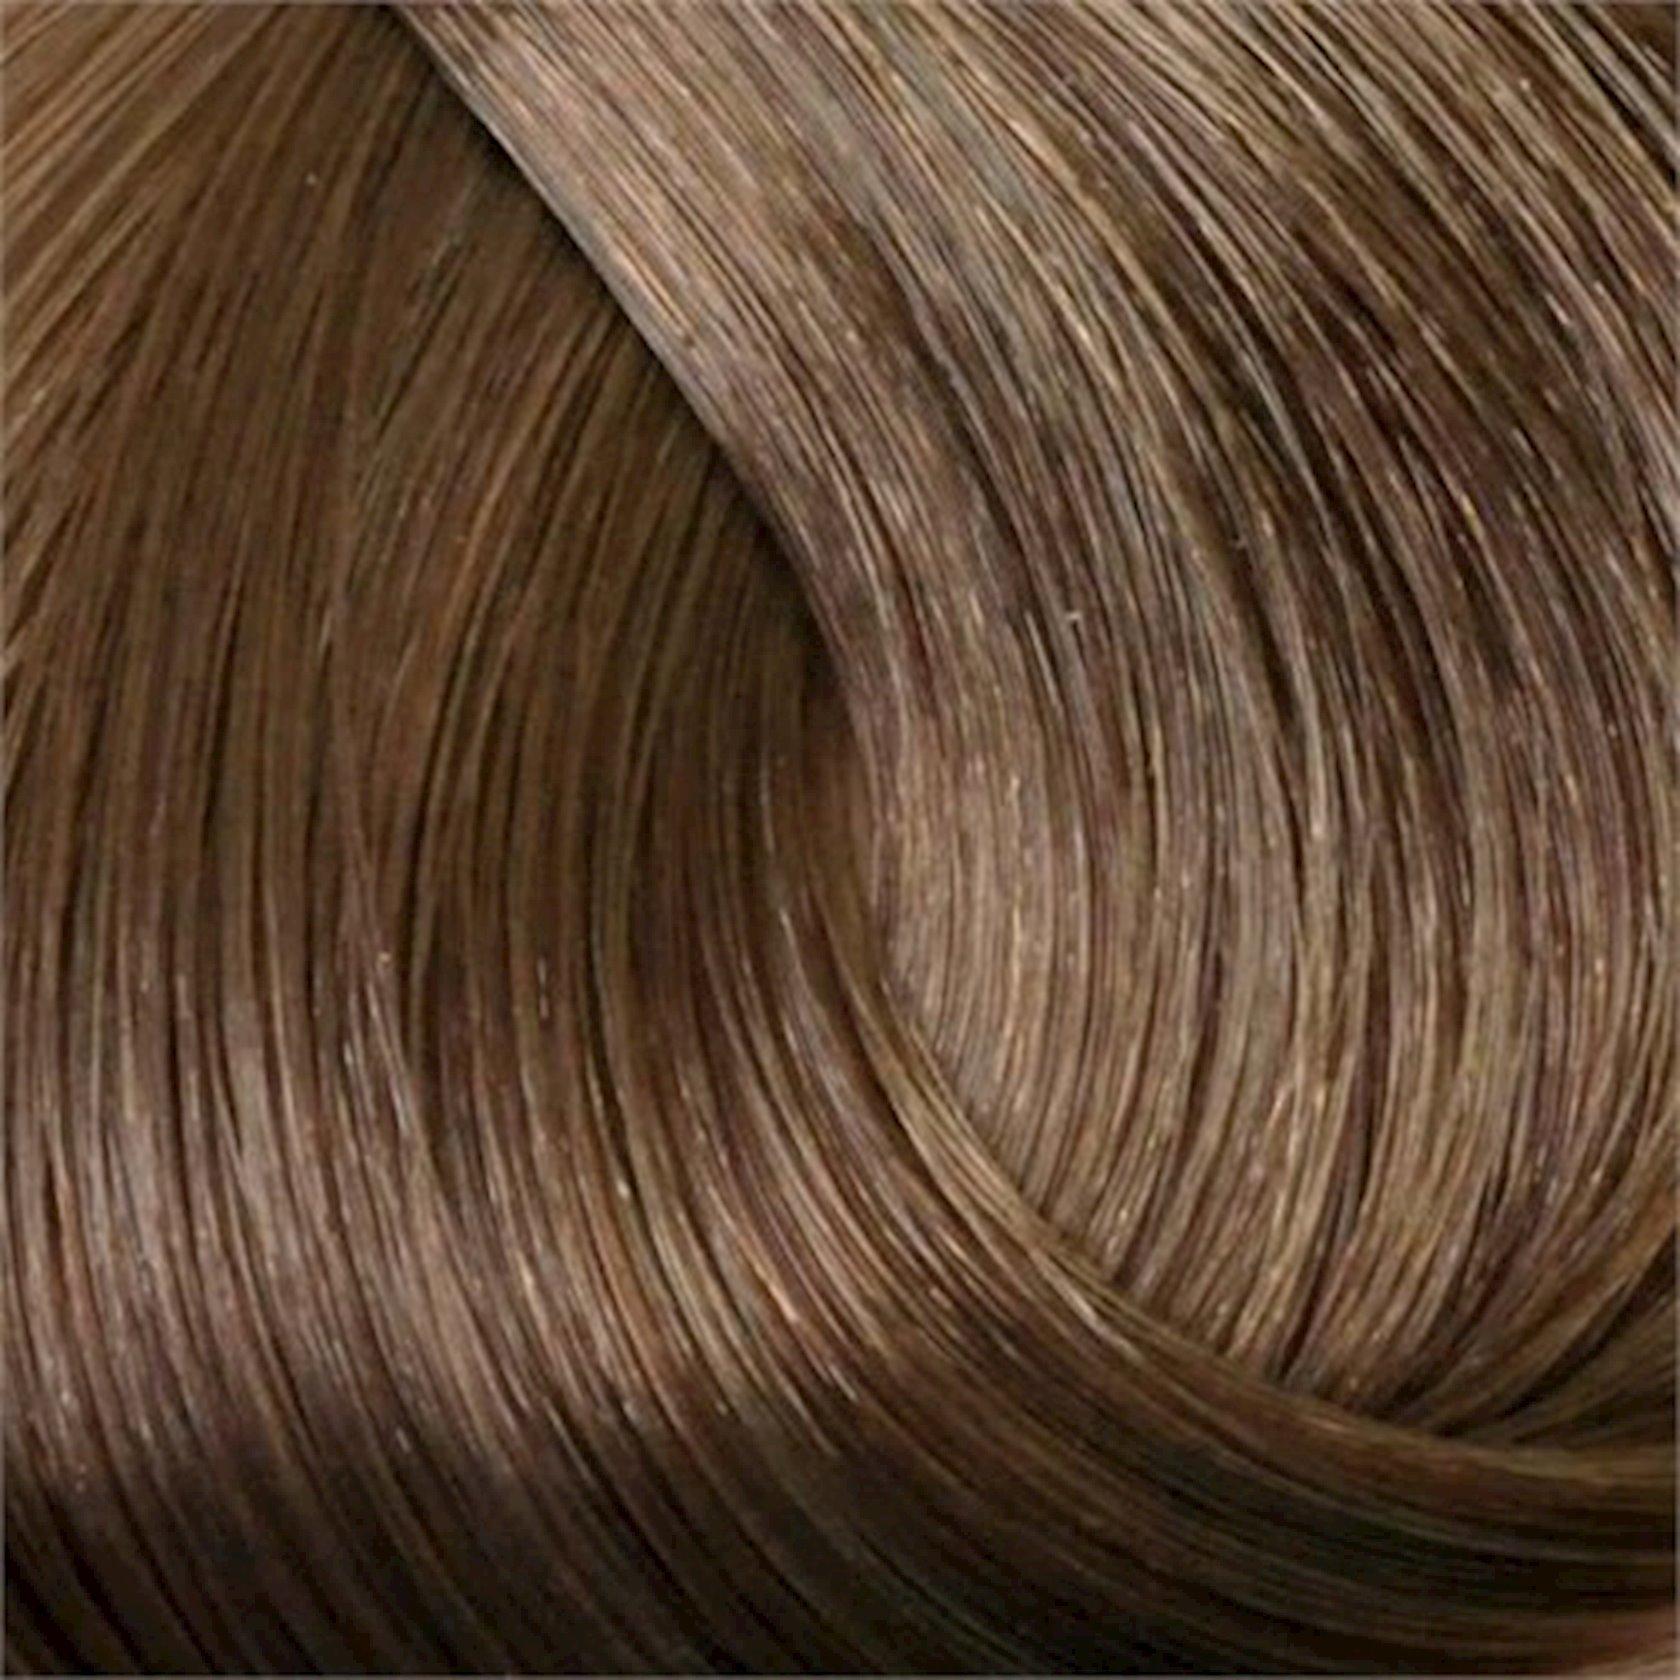 Saç üçün qalıcı krem boya Exicolor Permanent Hair Color Cream 100 ml №7.79 Tütün Kumral, Tütün-şabalıdı